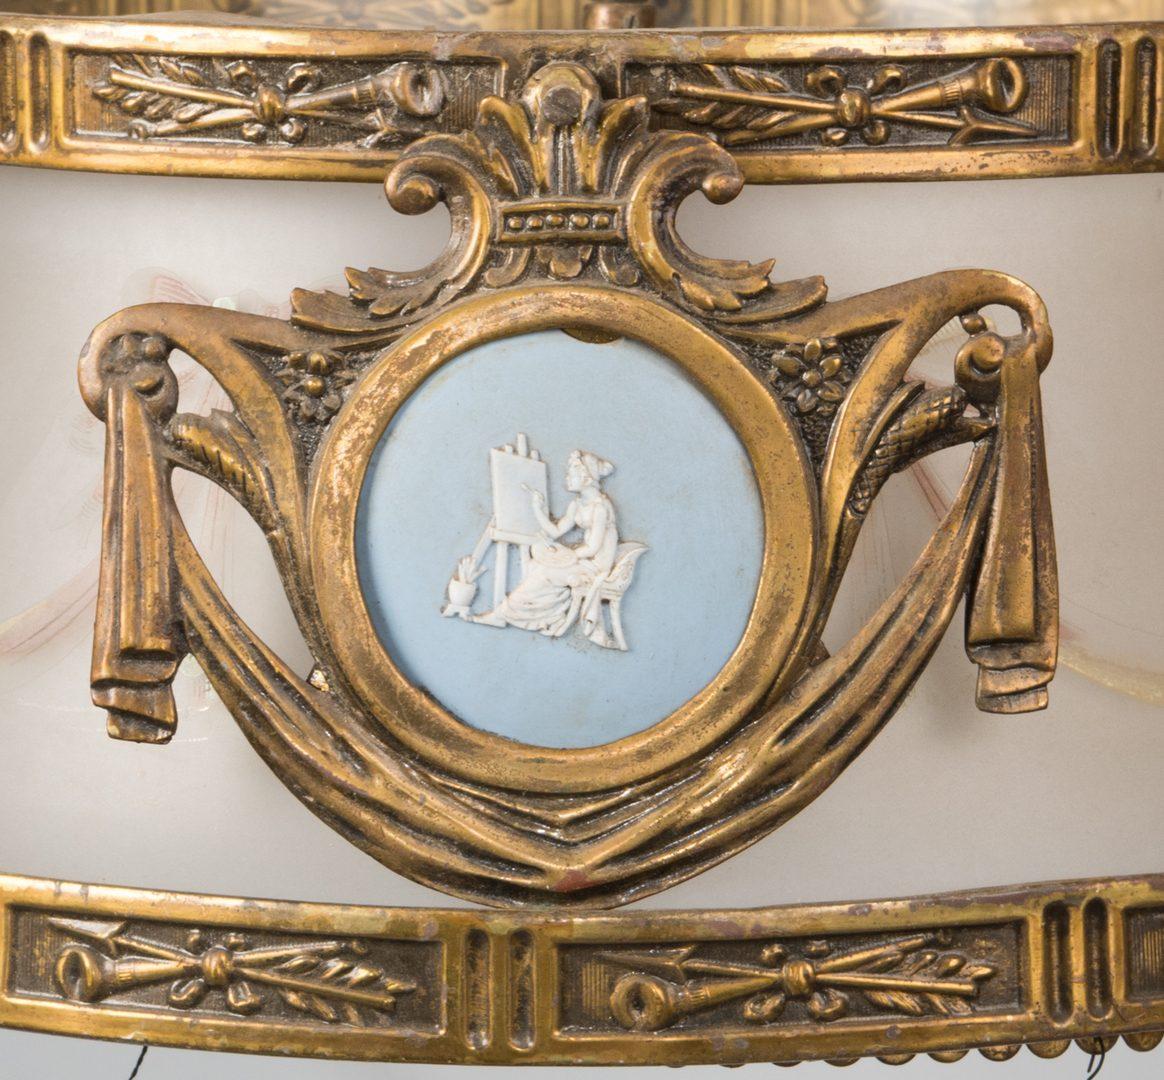 Lot 623: Regency Gilt Bronze Chandelier w/ Wedgwood Plaques